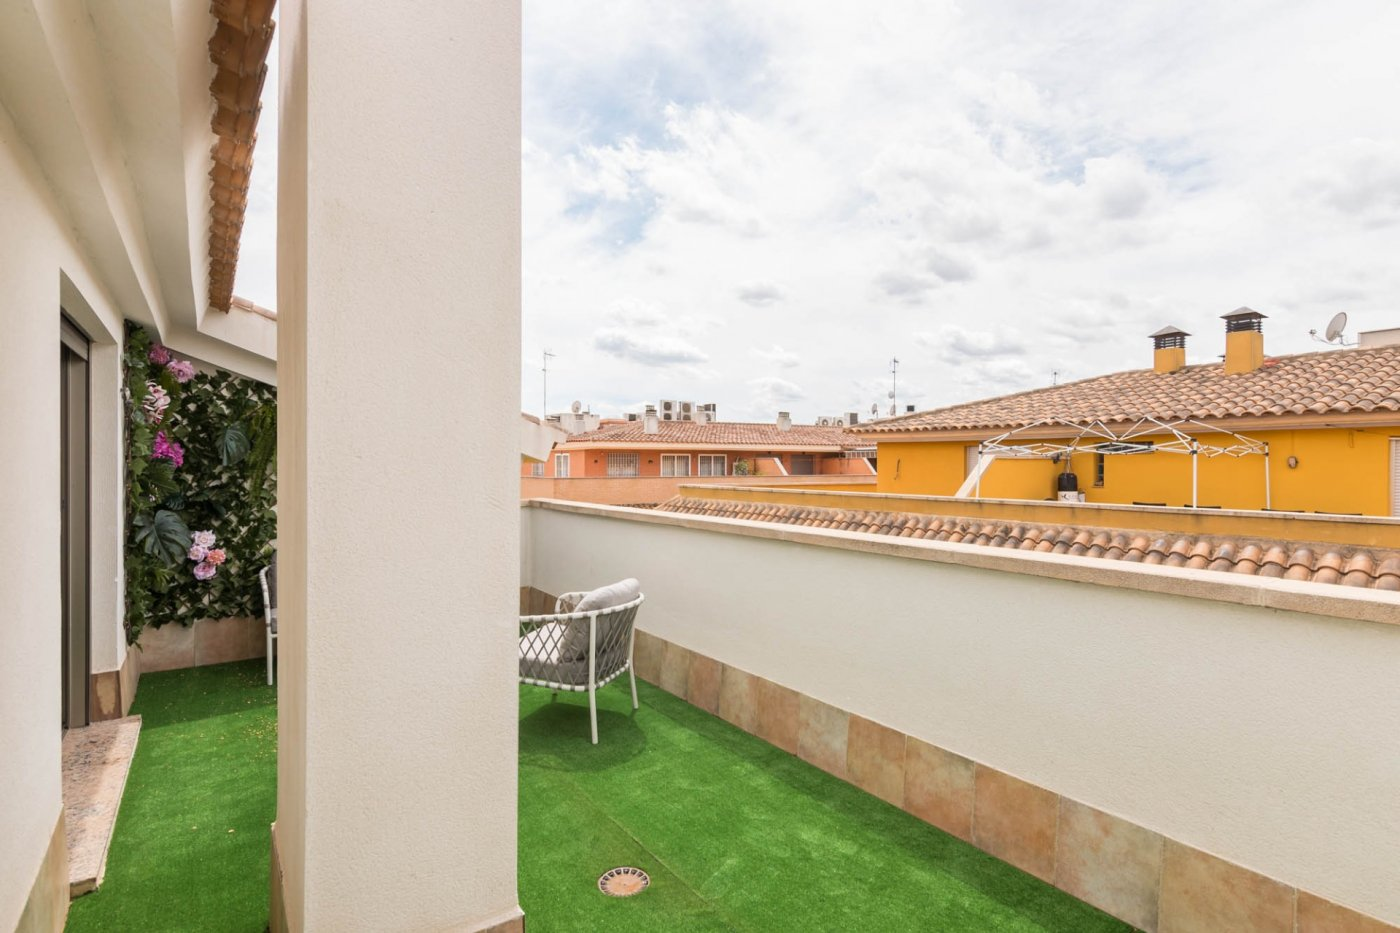 Ático Dúplex · Murcia · Casillas 118.500€€